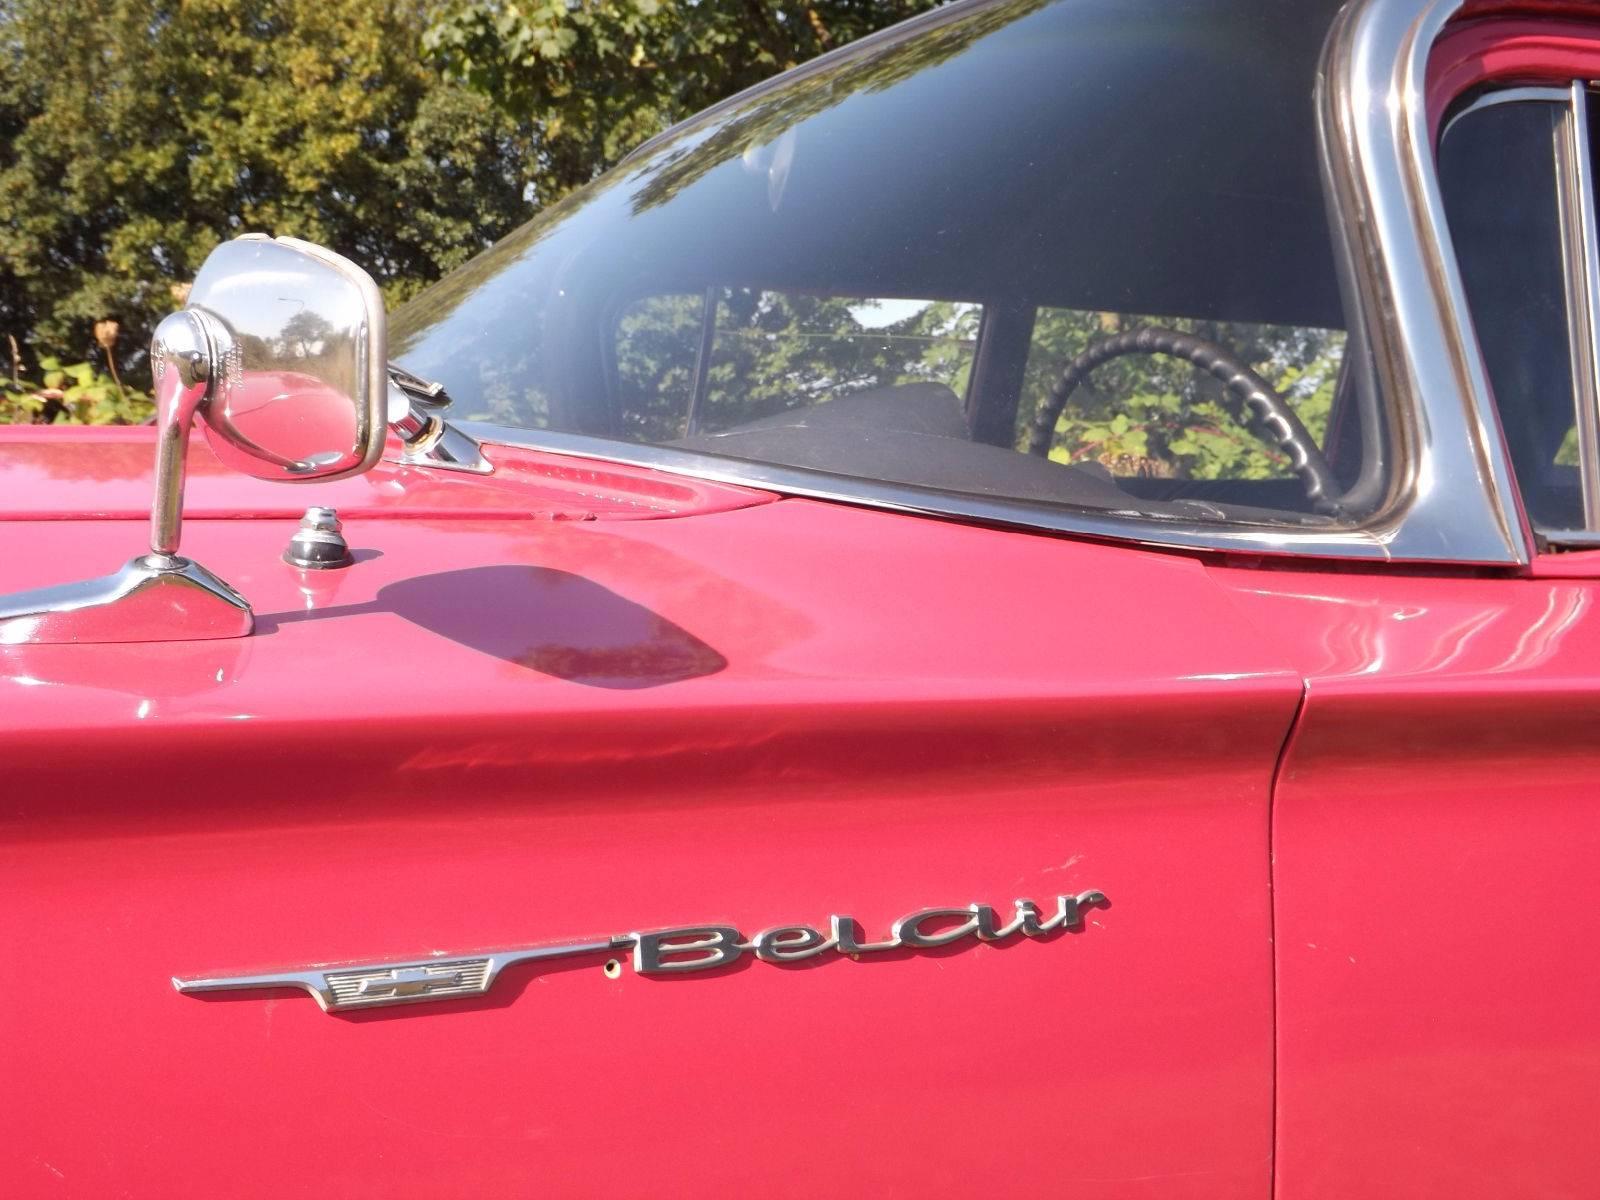 chevrolet bel air 1960 kaufen upcomingcarshqcom